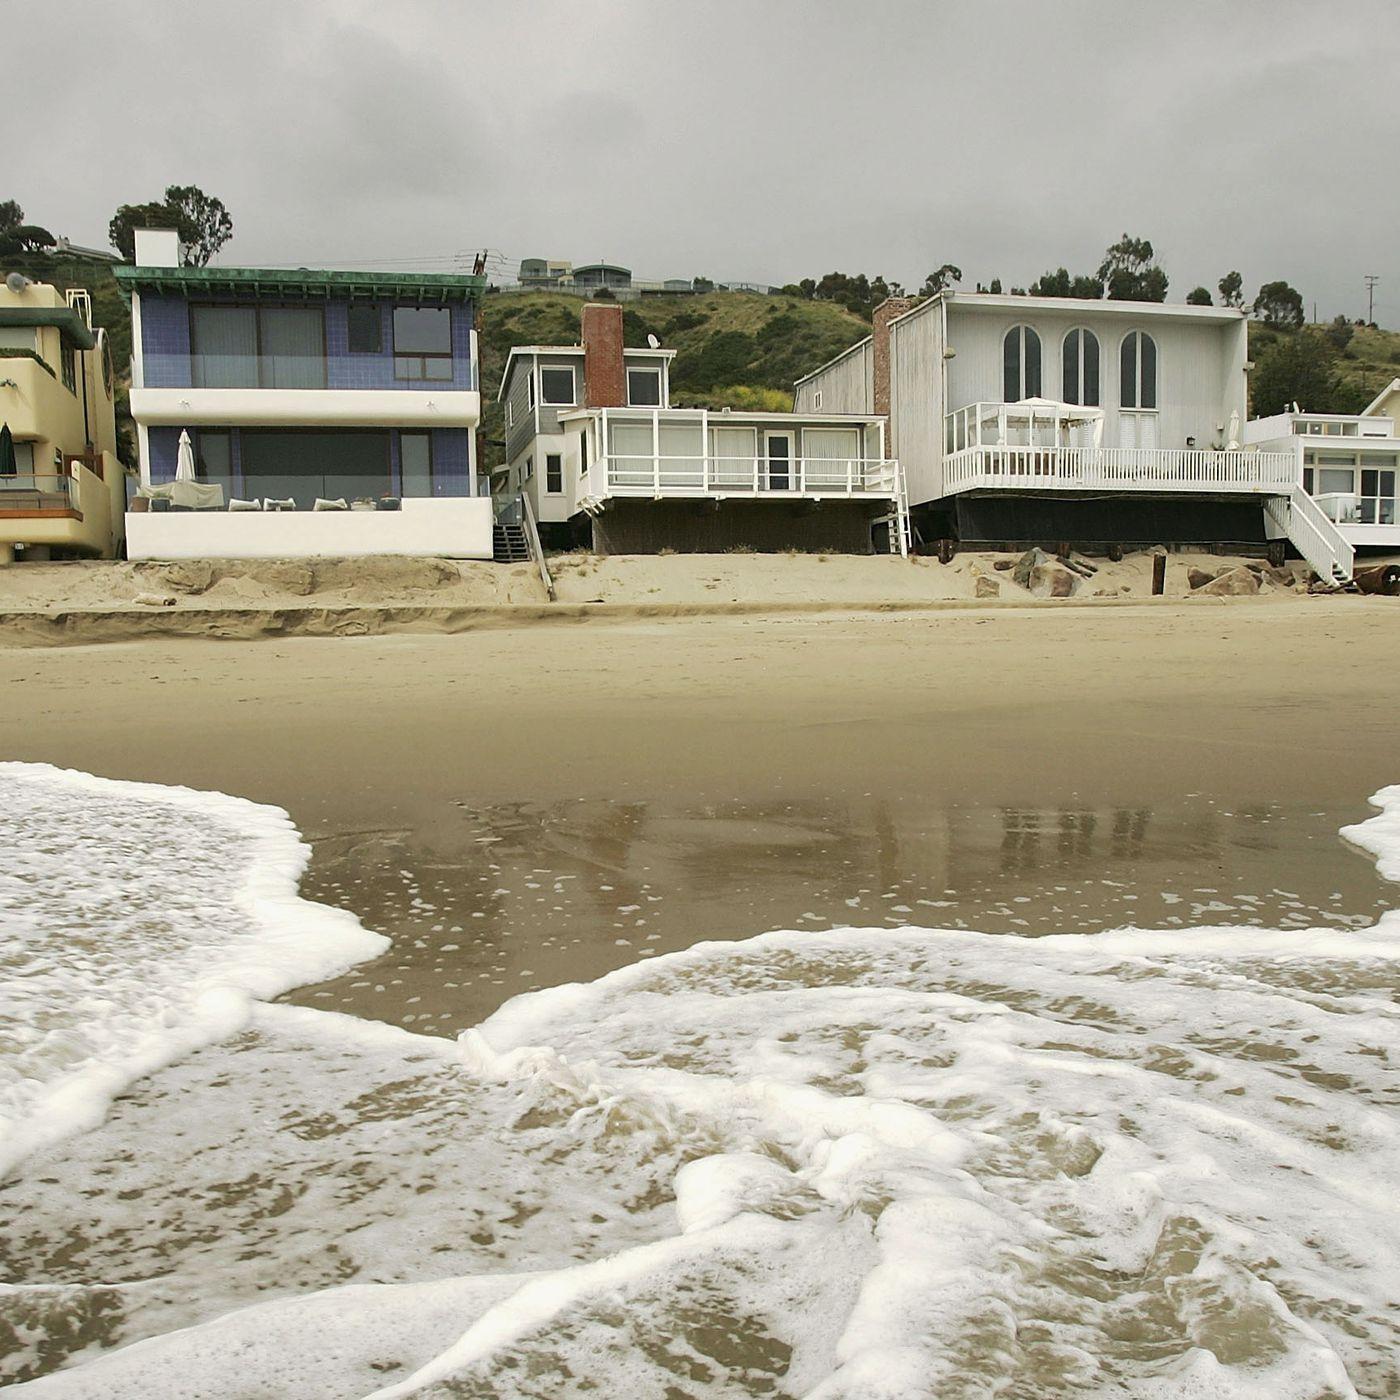 Sea level rise in Malibu - Curbed LA